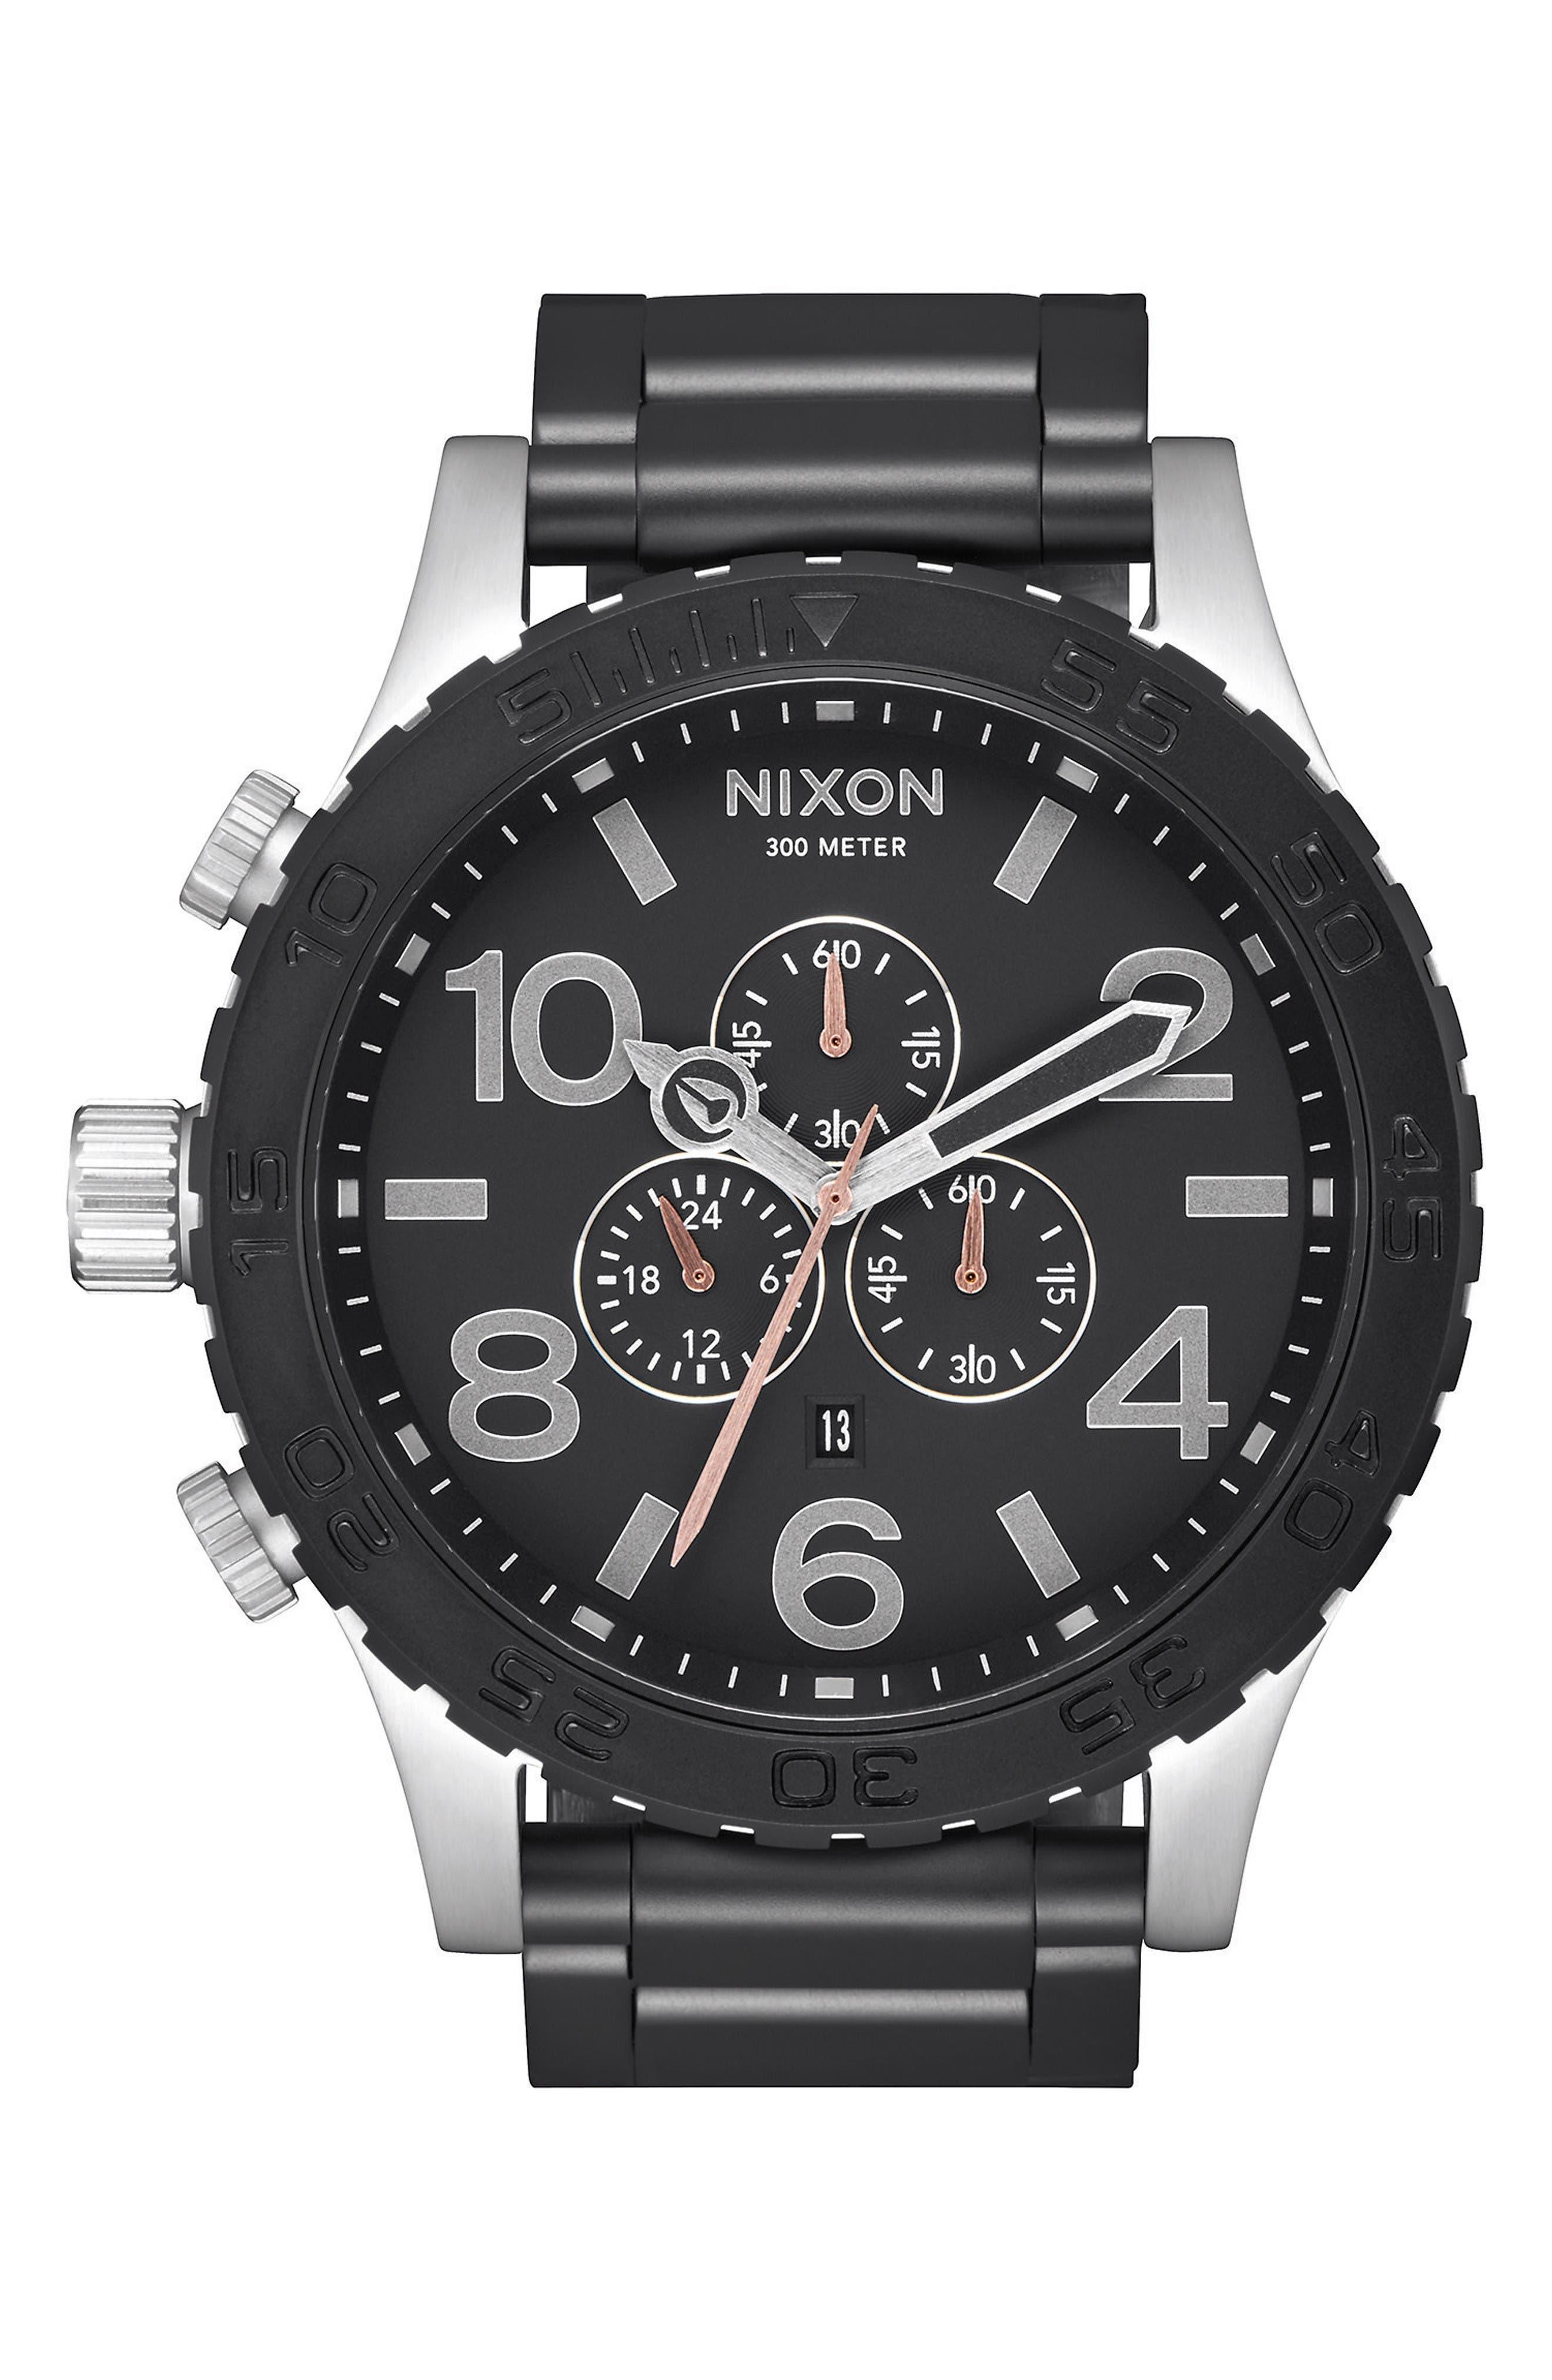 Main Image - Nixon 51-30 Chronograph Watch, 51mm